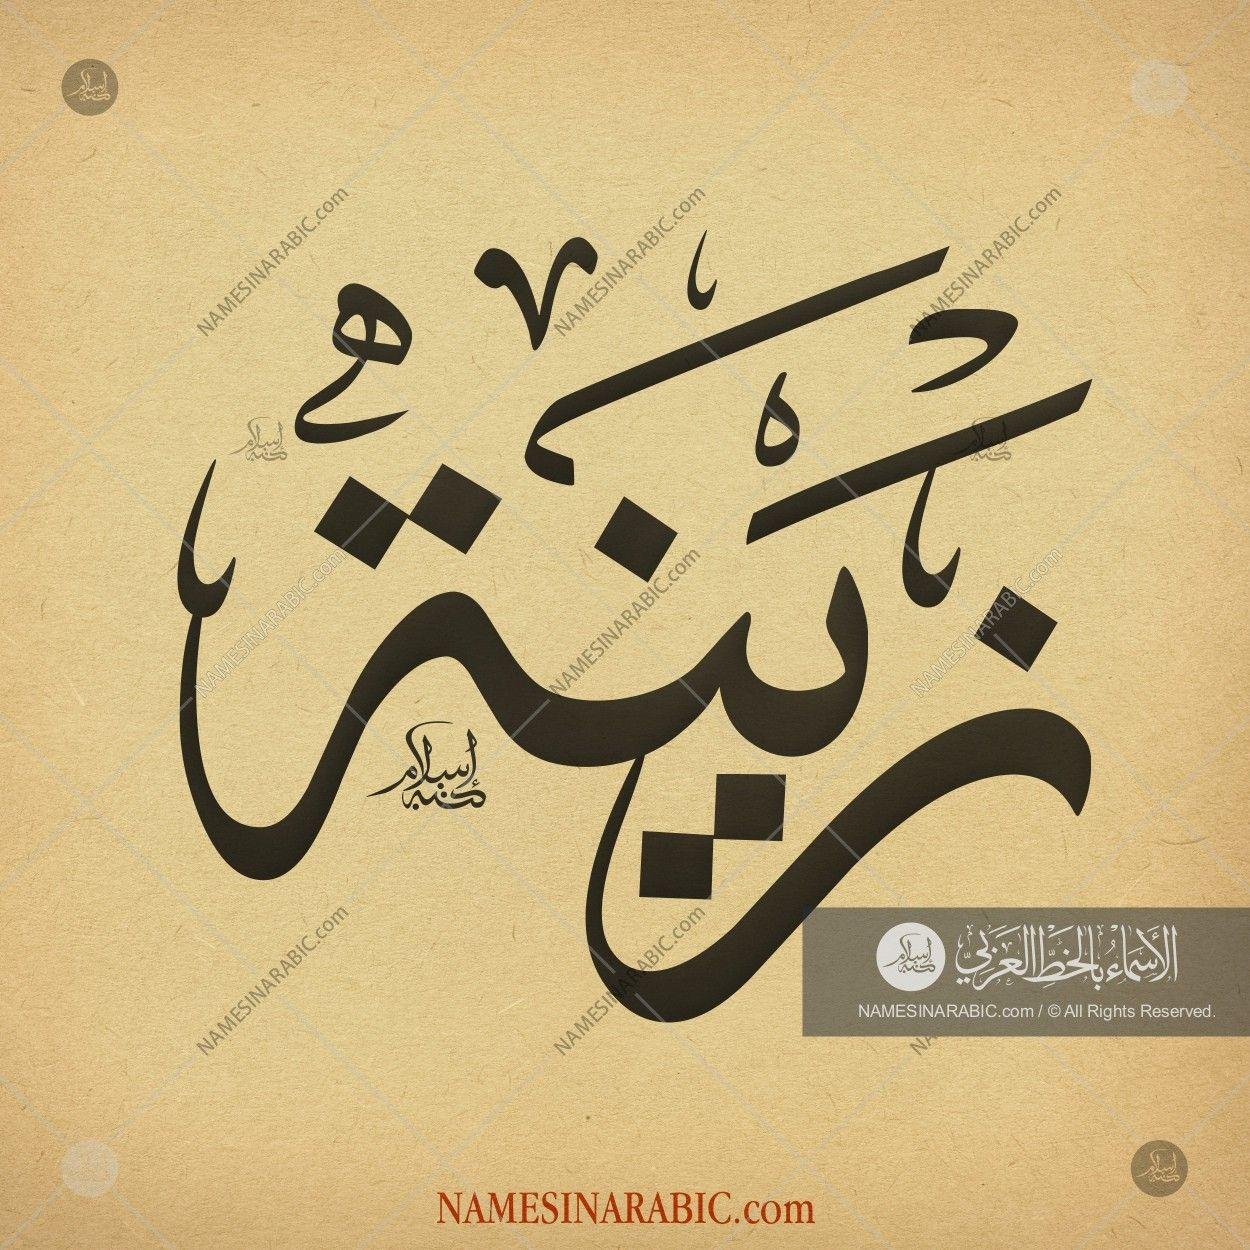 Zaina زينة Names In Arabic Calligraphy Name 3575 Calligraphy Name Calligraphy Arabic Calligraphy Design